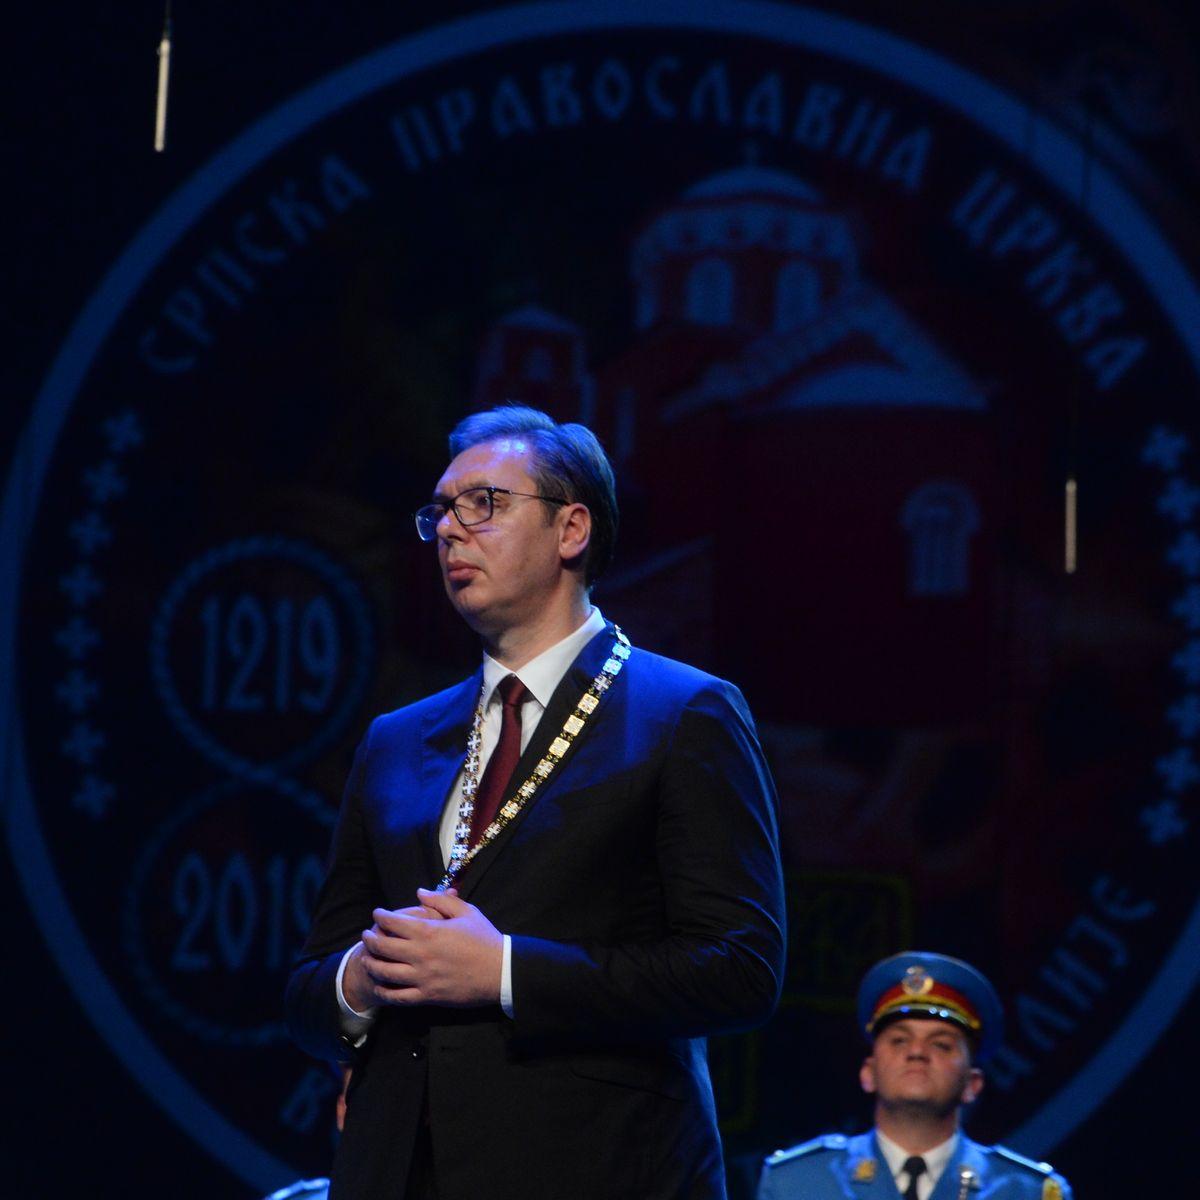 Predsednik Vučić odlikovan Ordenom Svetog Save prvoga stepena